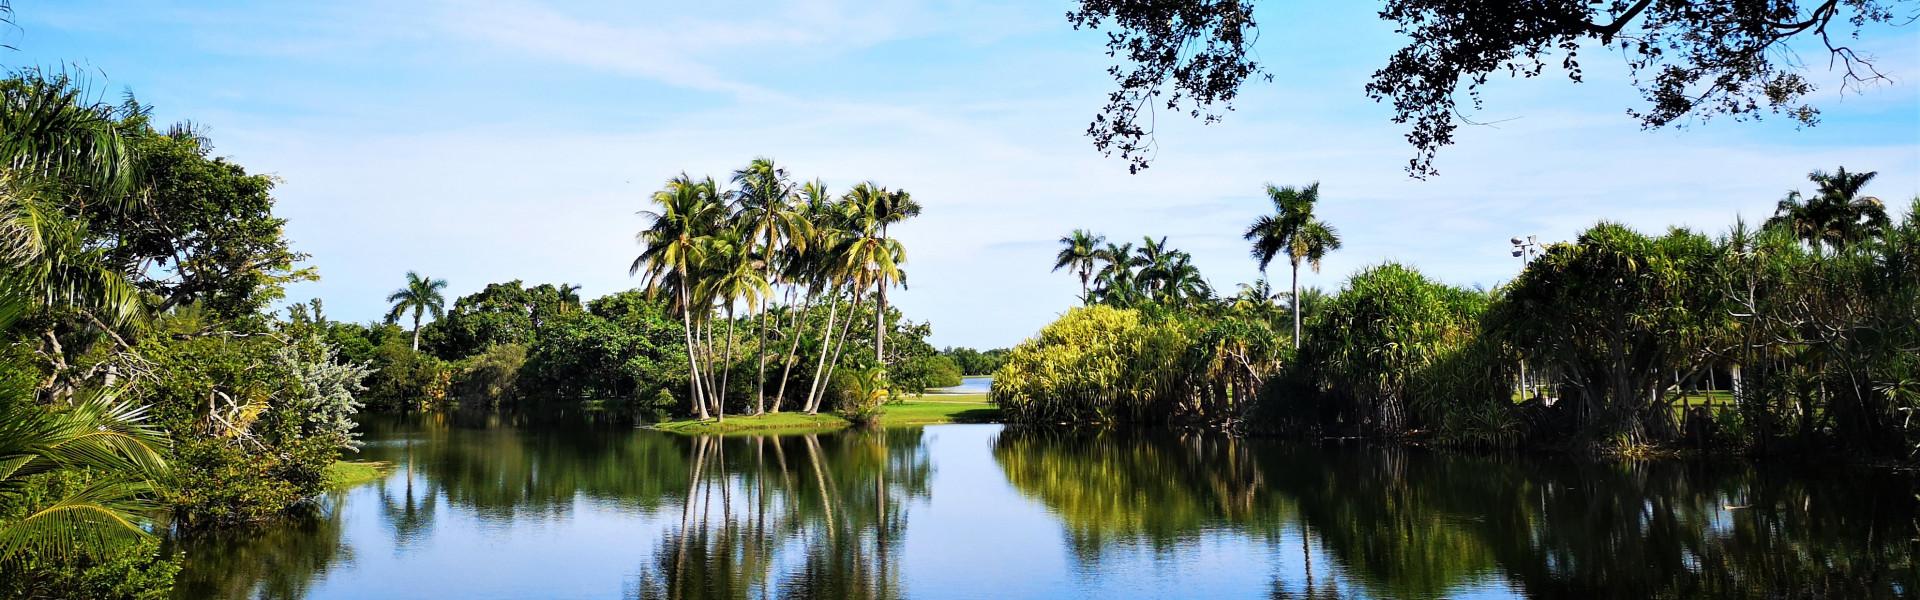 Main image ofLa Floride du Sud